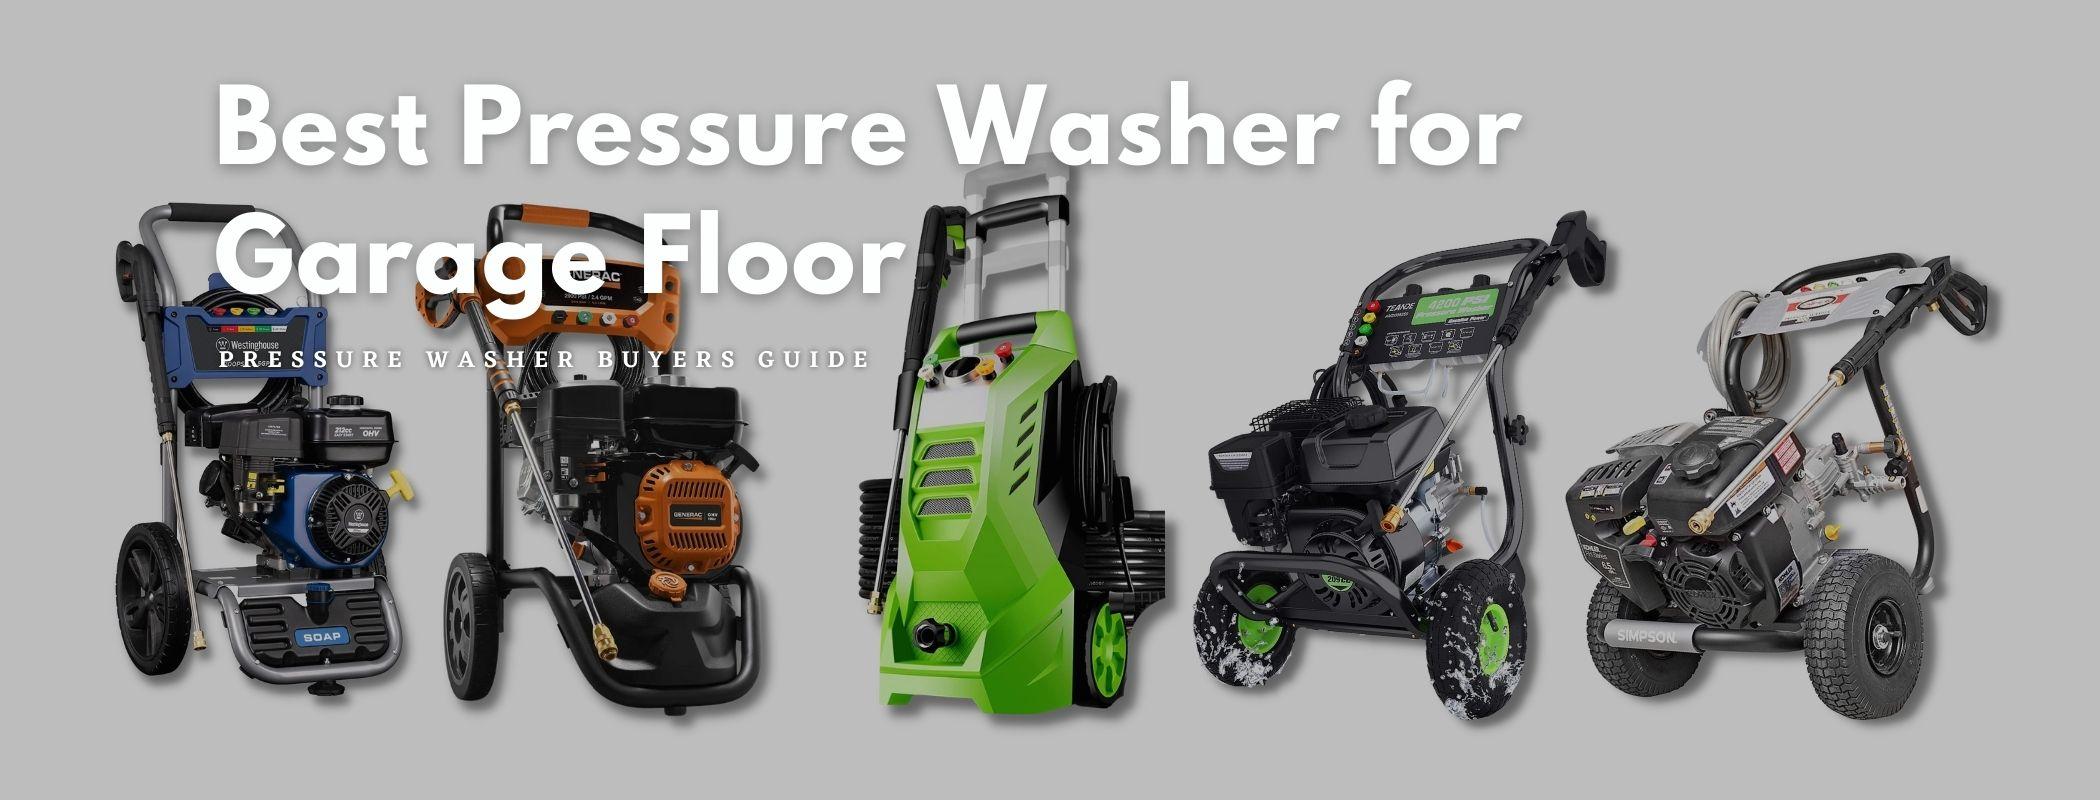 Best Pressure Washer for Garage Floor - Buyers Guide (1)